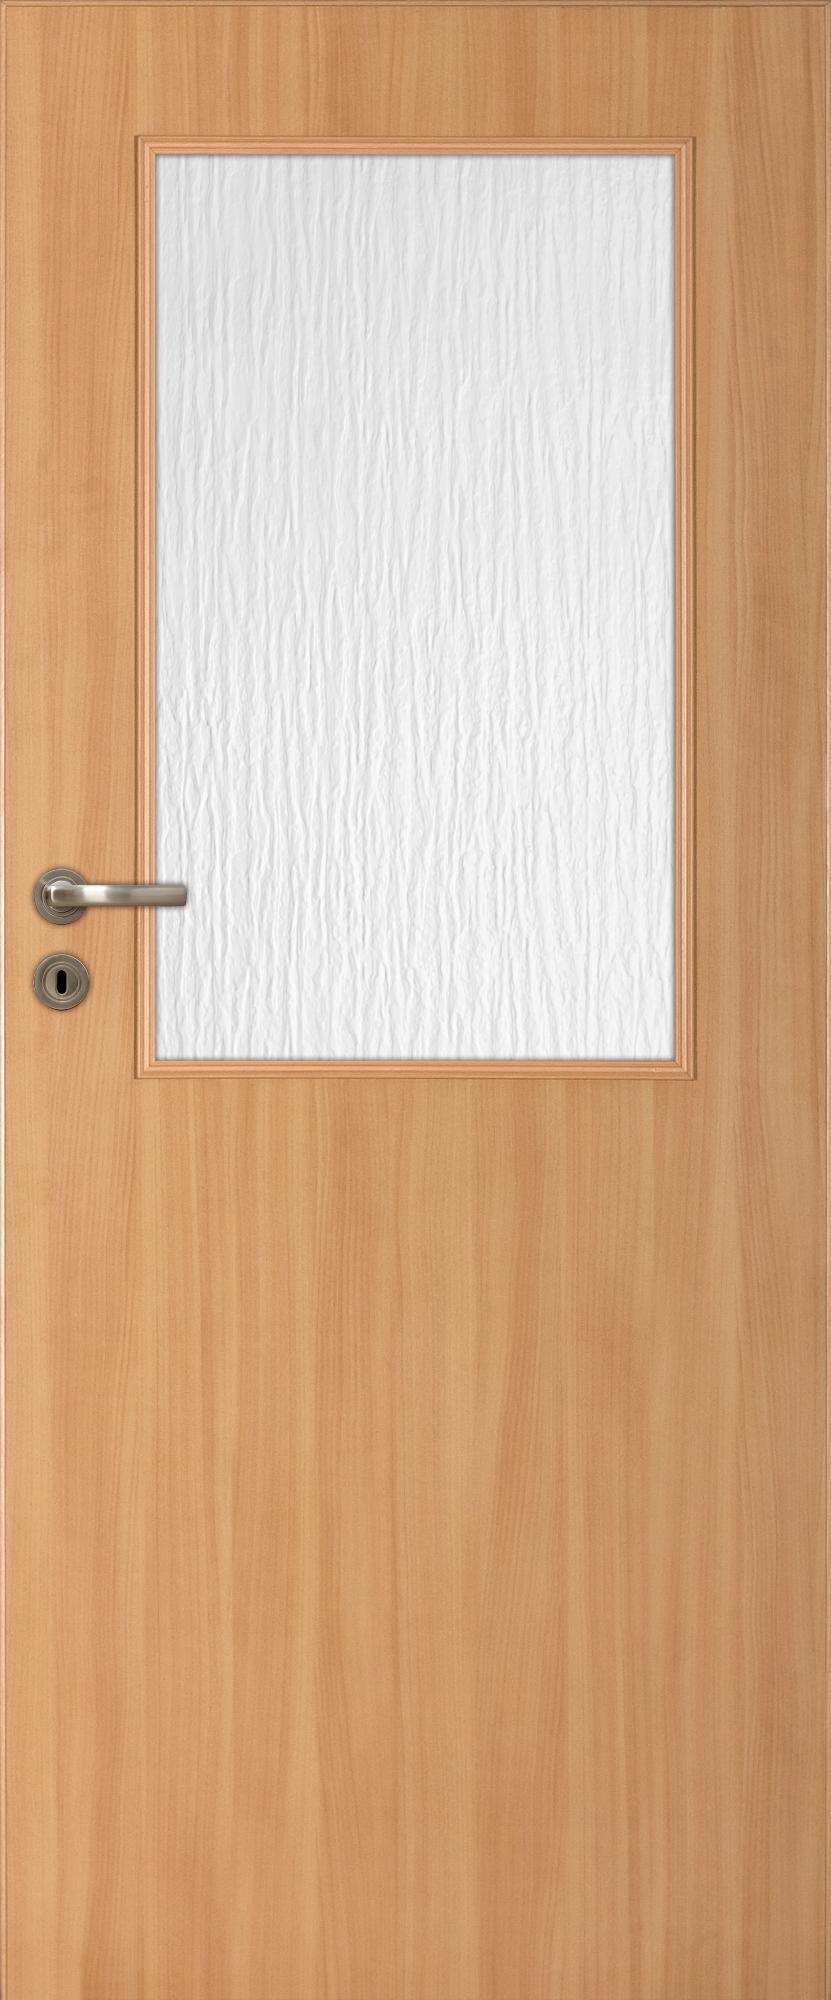 Interiérové dveře DRE LACK 30